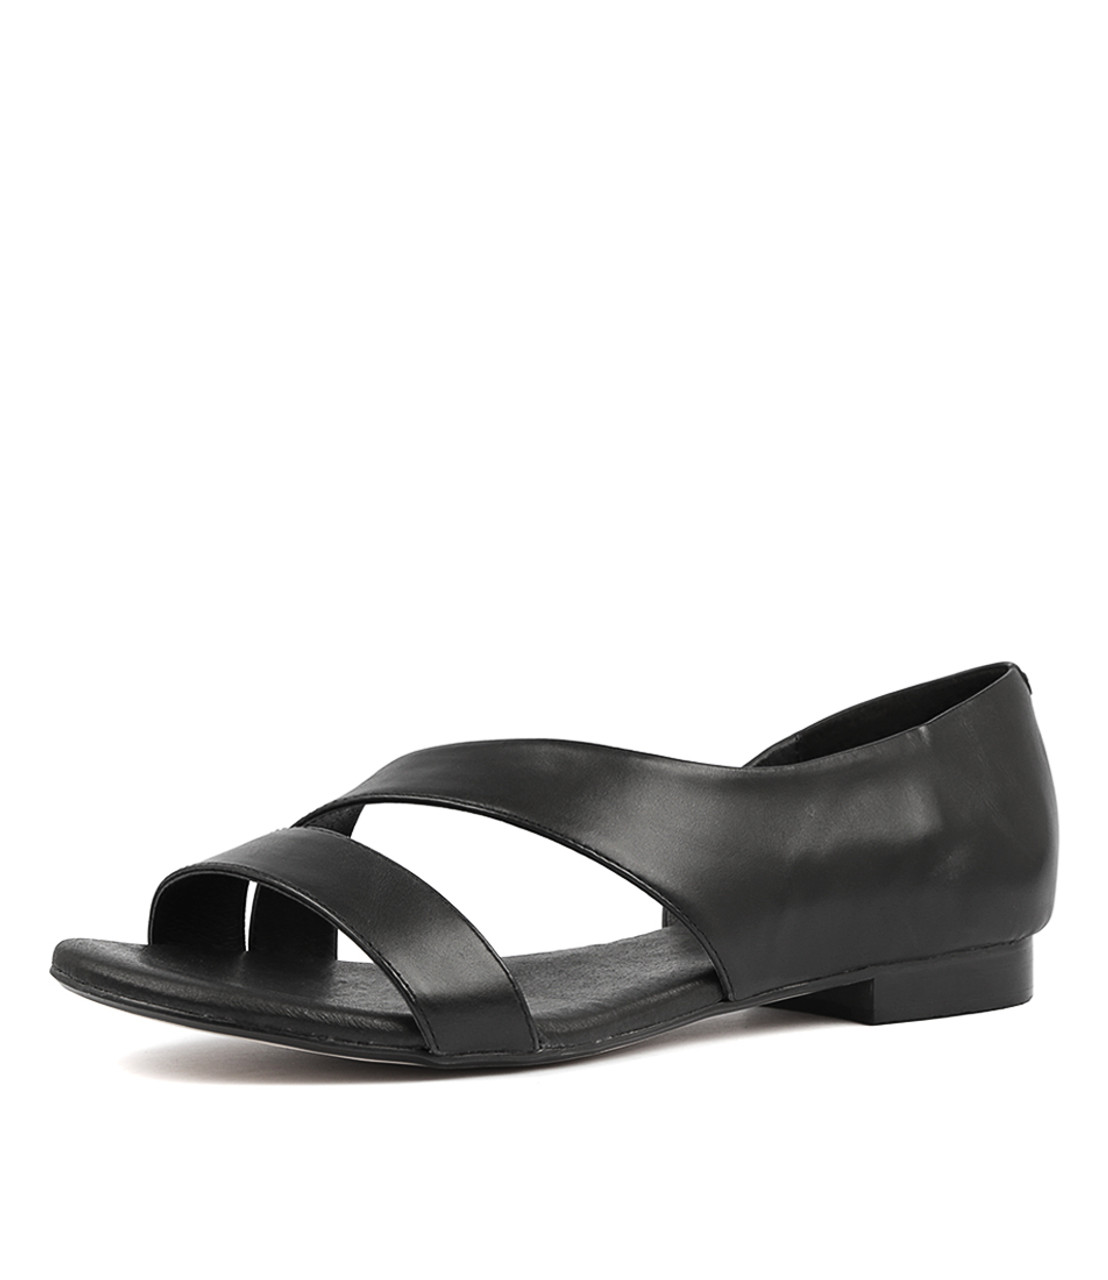 PURL Sandals Black Leather Django and Juliette